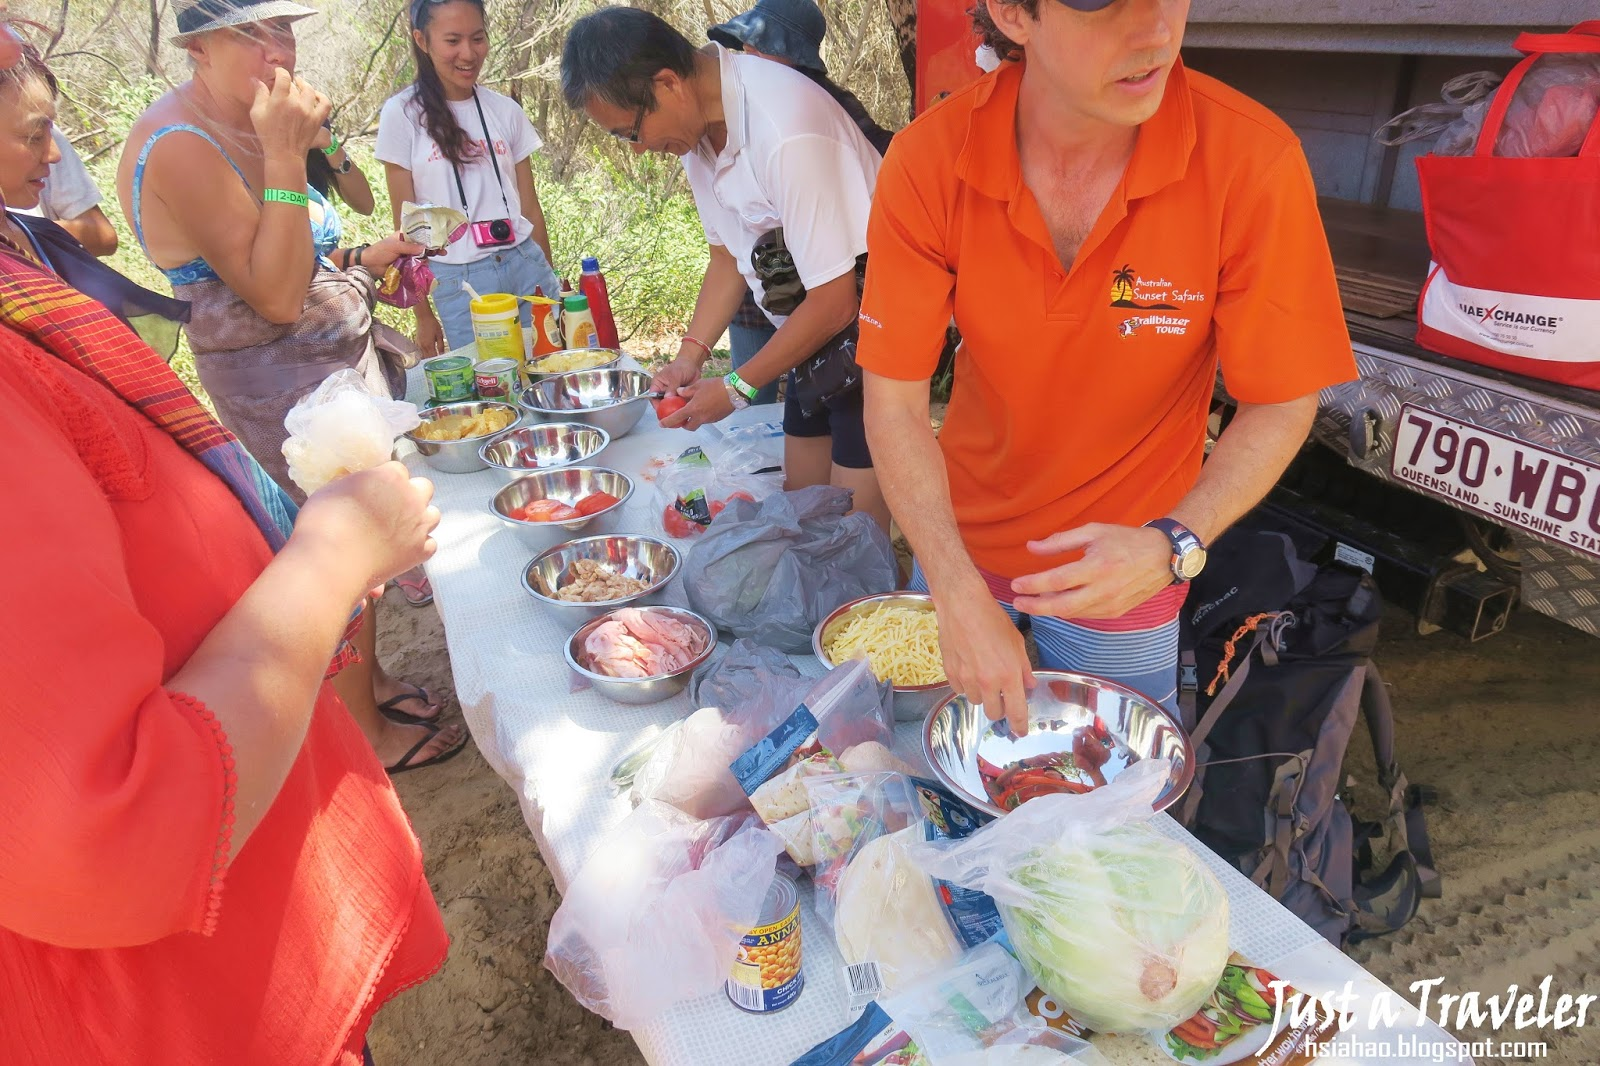 布里斯本-摩頓島-美食-推薦-旅遊-自由行-澳洲-Brisbane-Moreton-Island-Tourist-Attraction-Travel-Australia